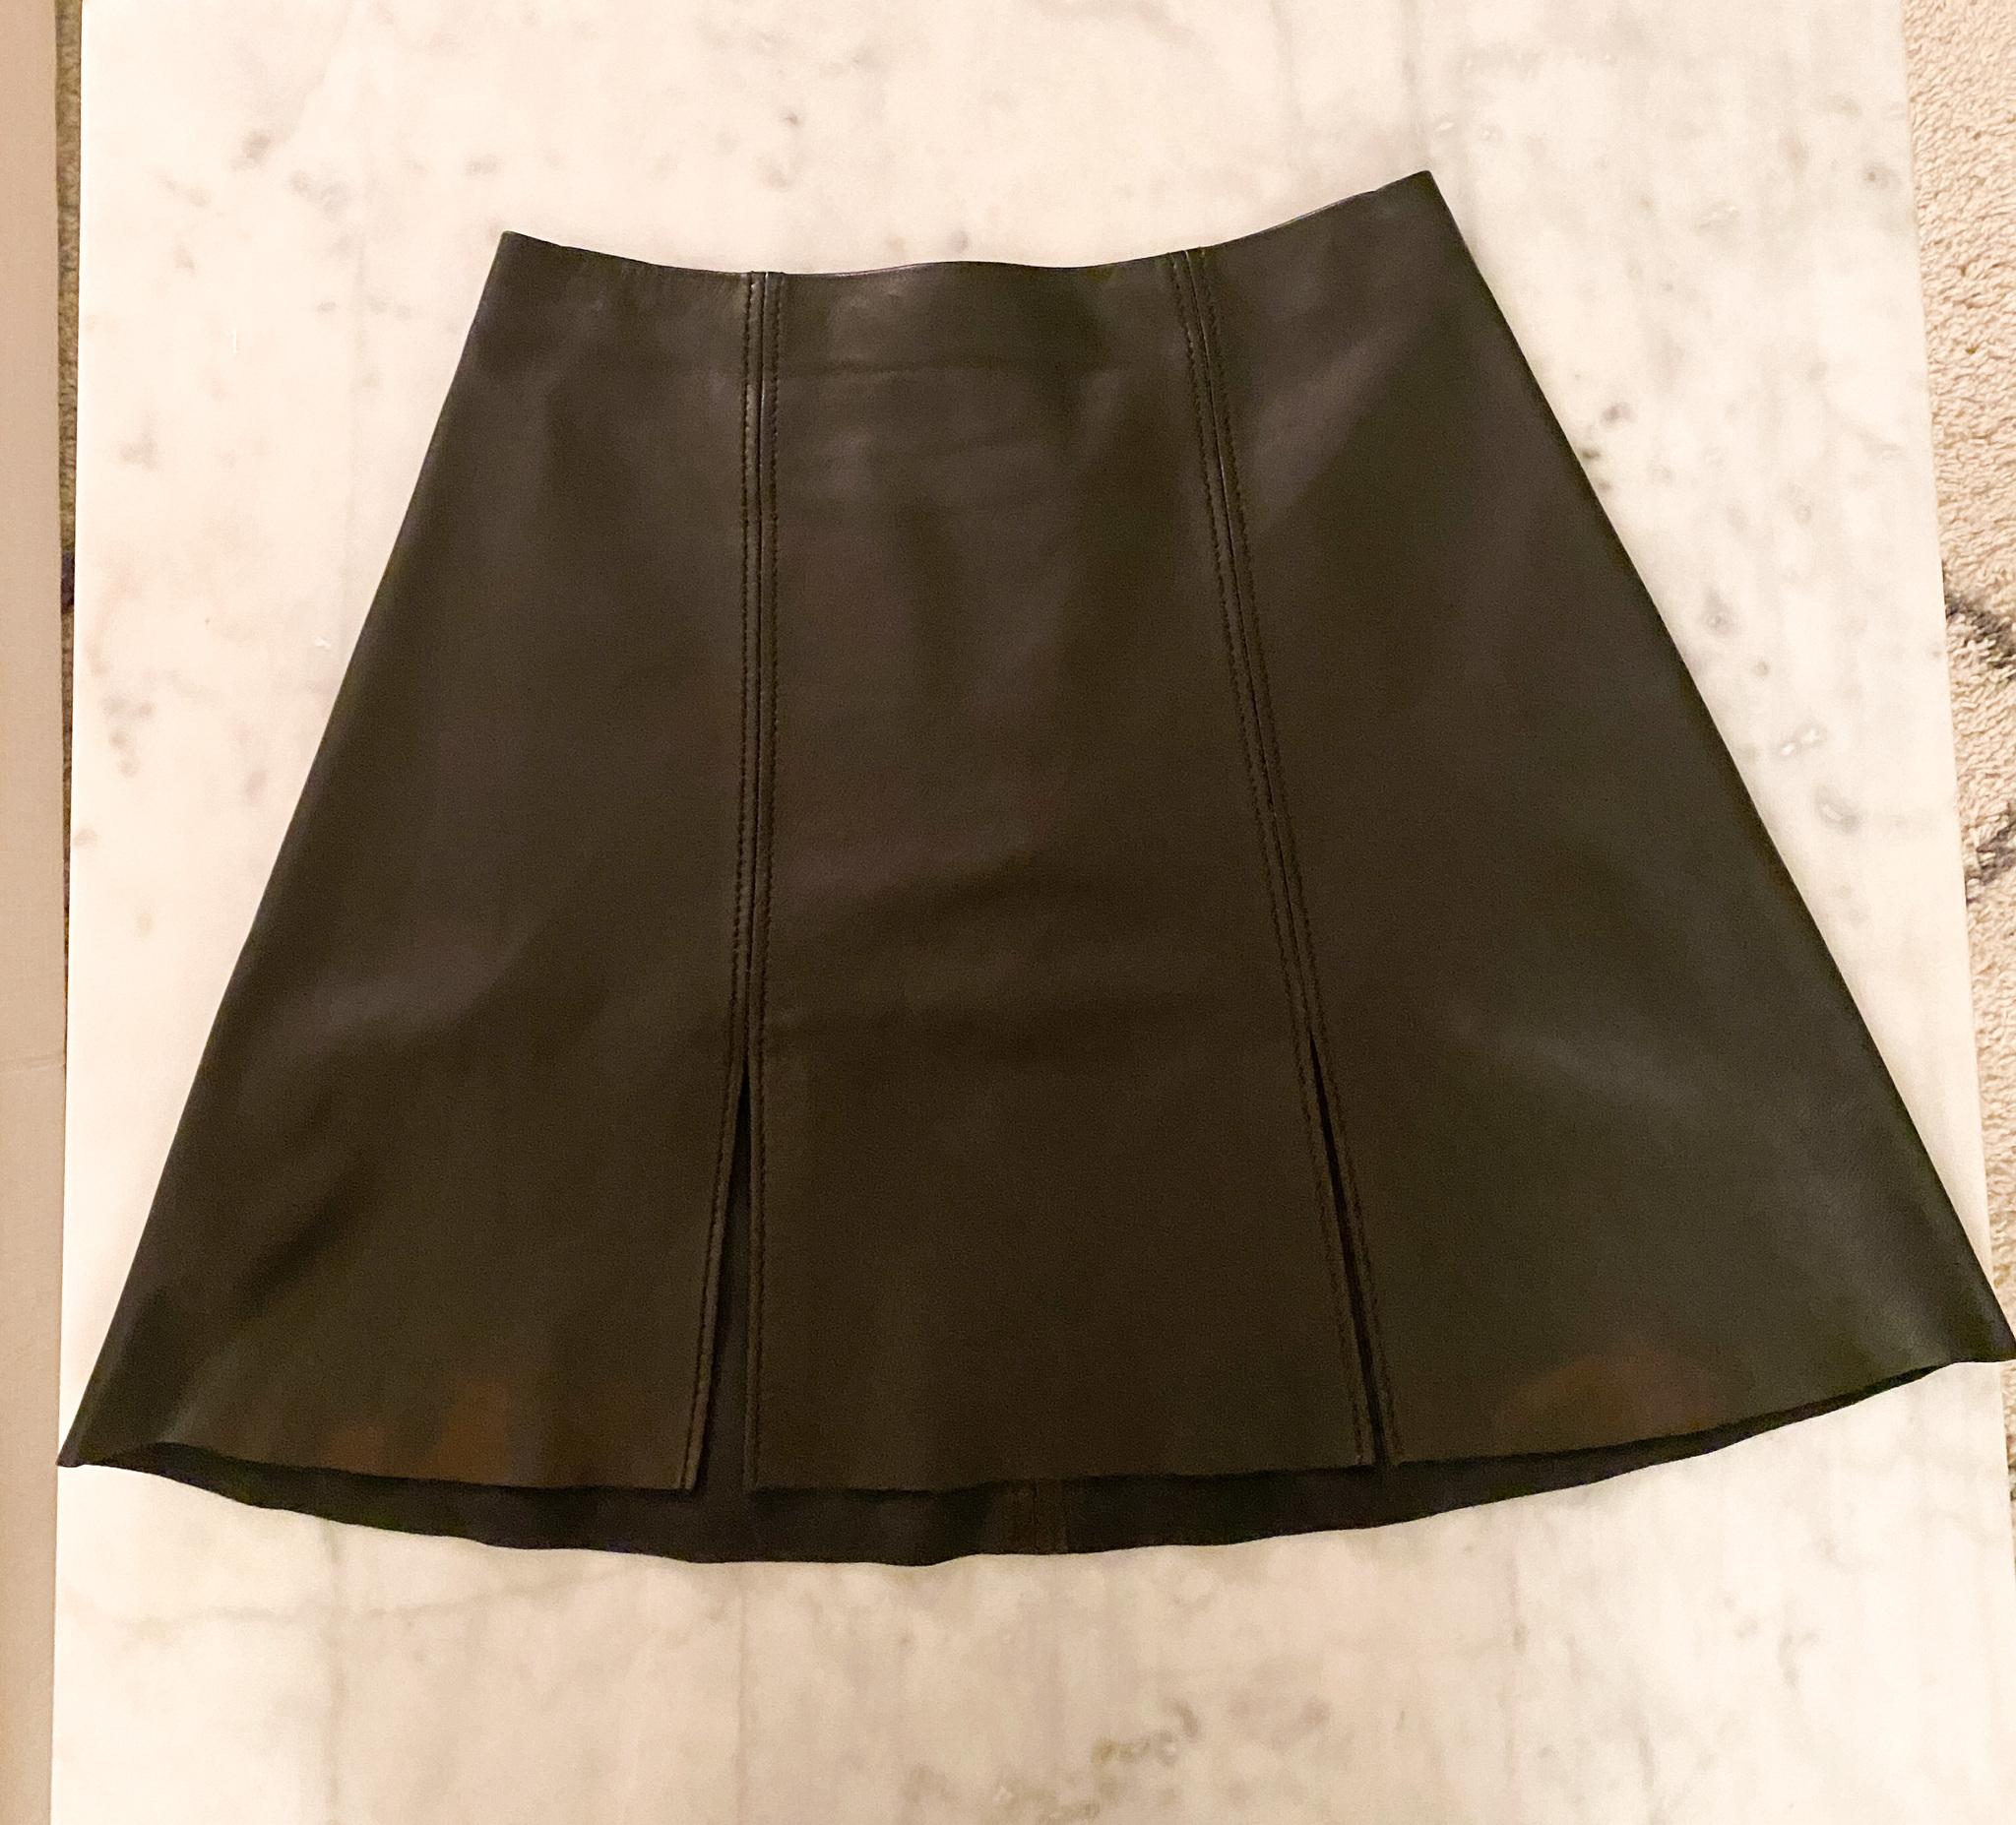 ACNE STUDIOS Leala Leather Skirt (40)